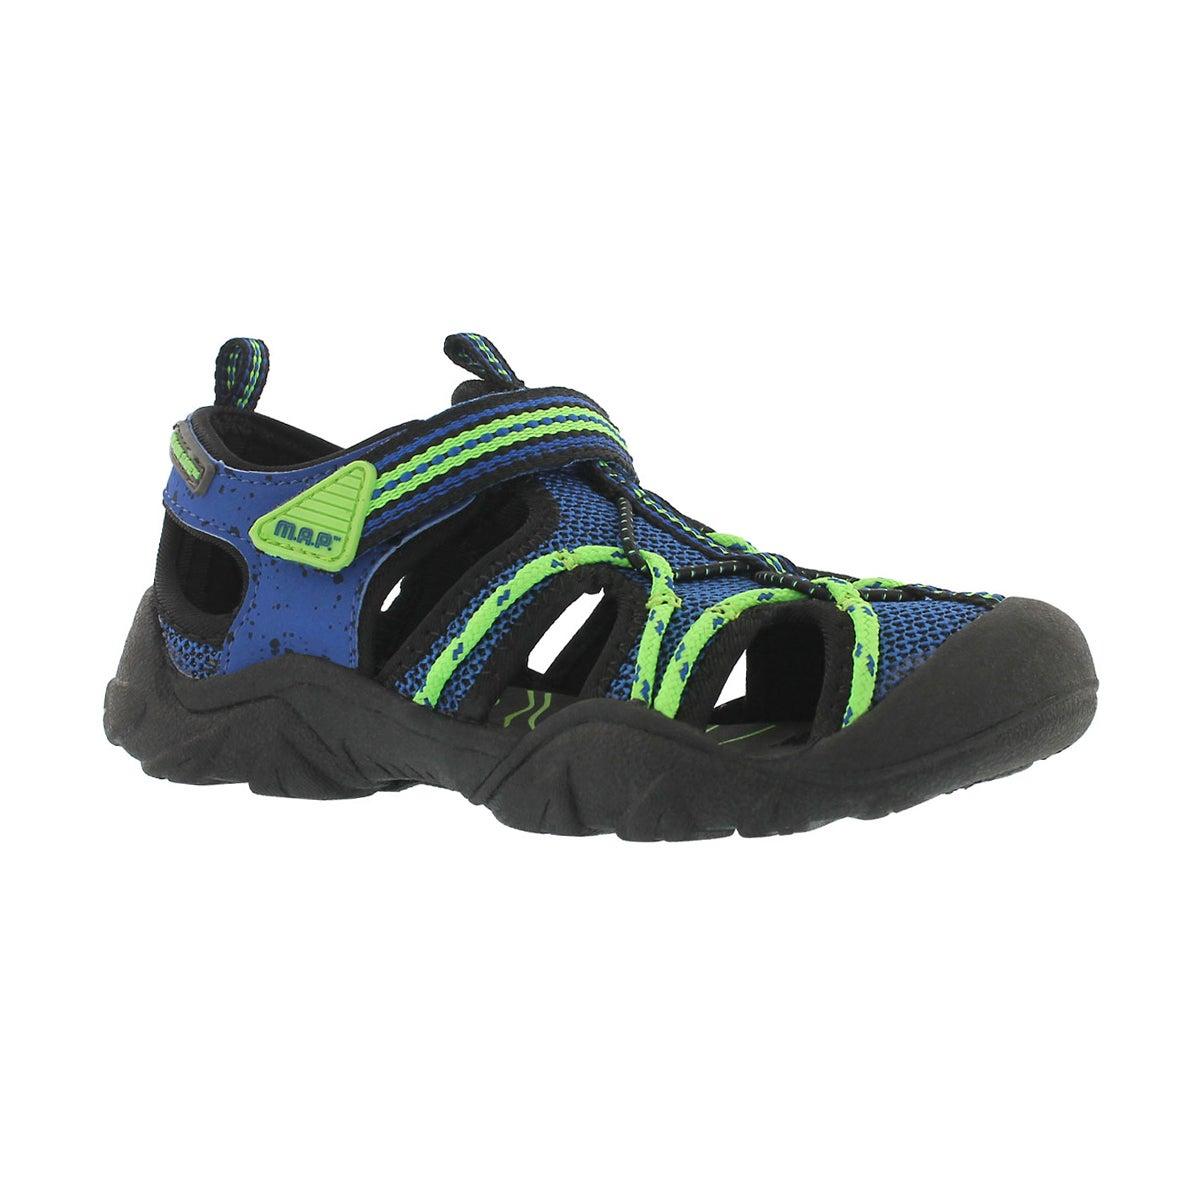 Boys' EMMONS black/blue fisherman sandals